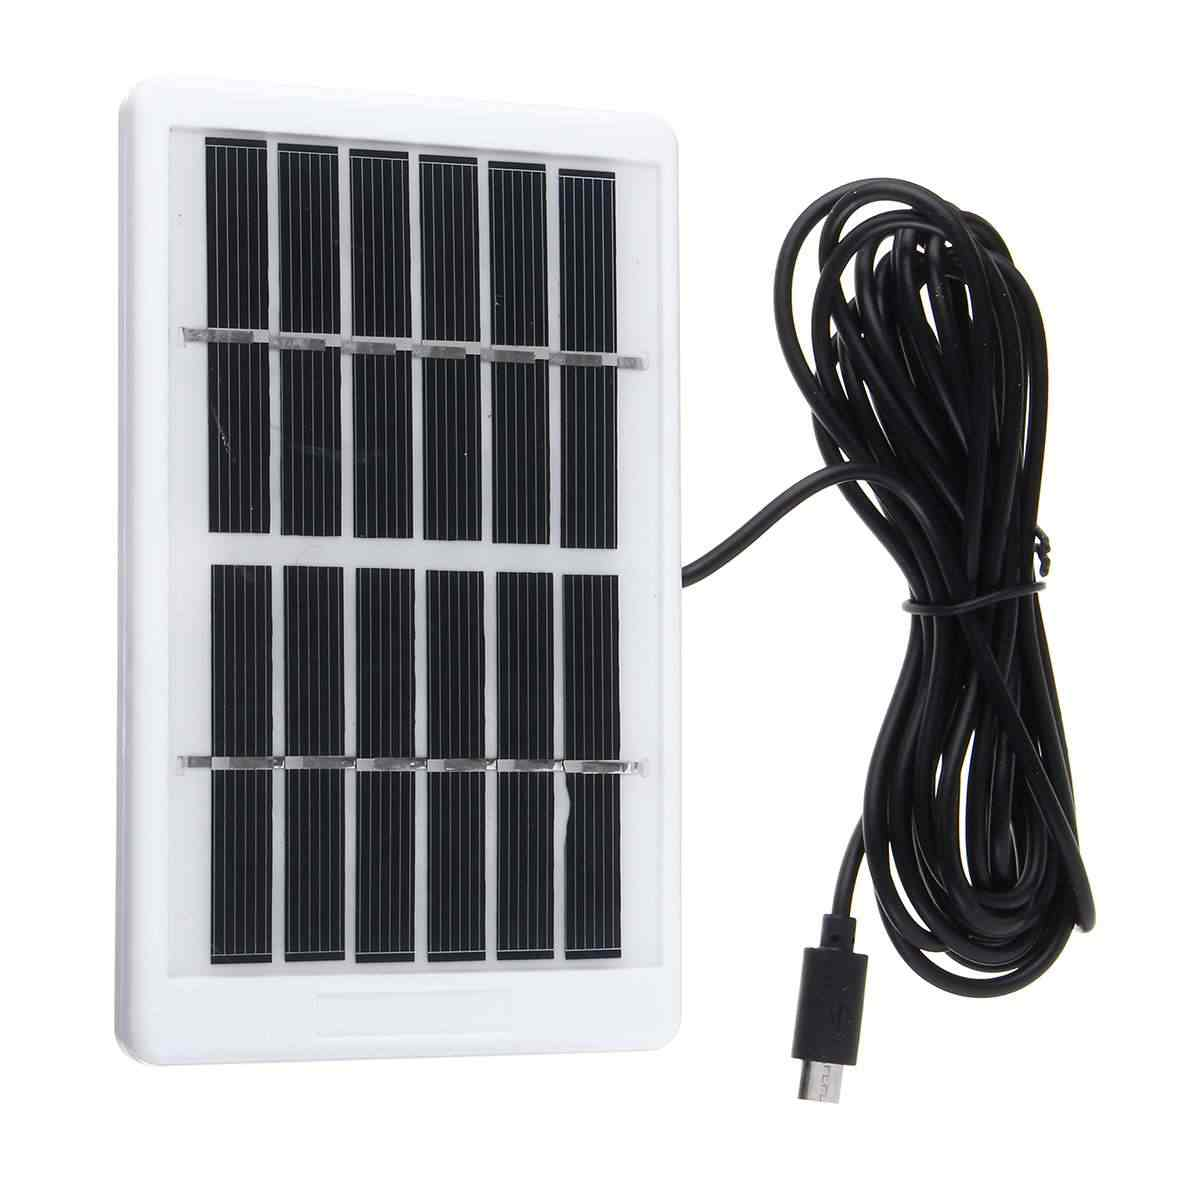 Panel Tenaga Surya/Solar Panel Mini Solar System Diy untuk Sel Baterai Charger Telepon Portabel Solar Cell untuk Multi-Fungsi Rumah Tangga Berkemah 6V12W